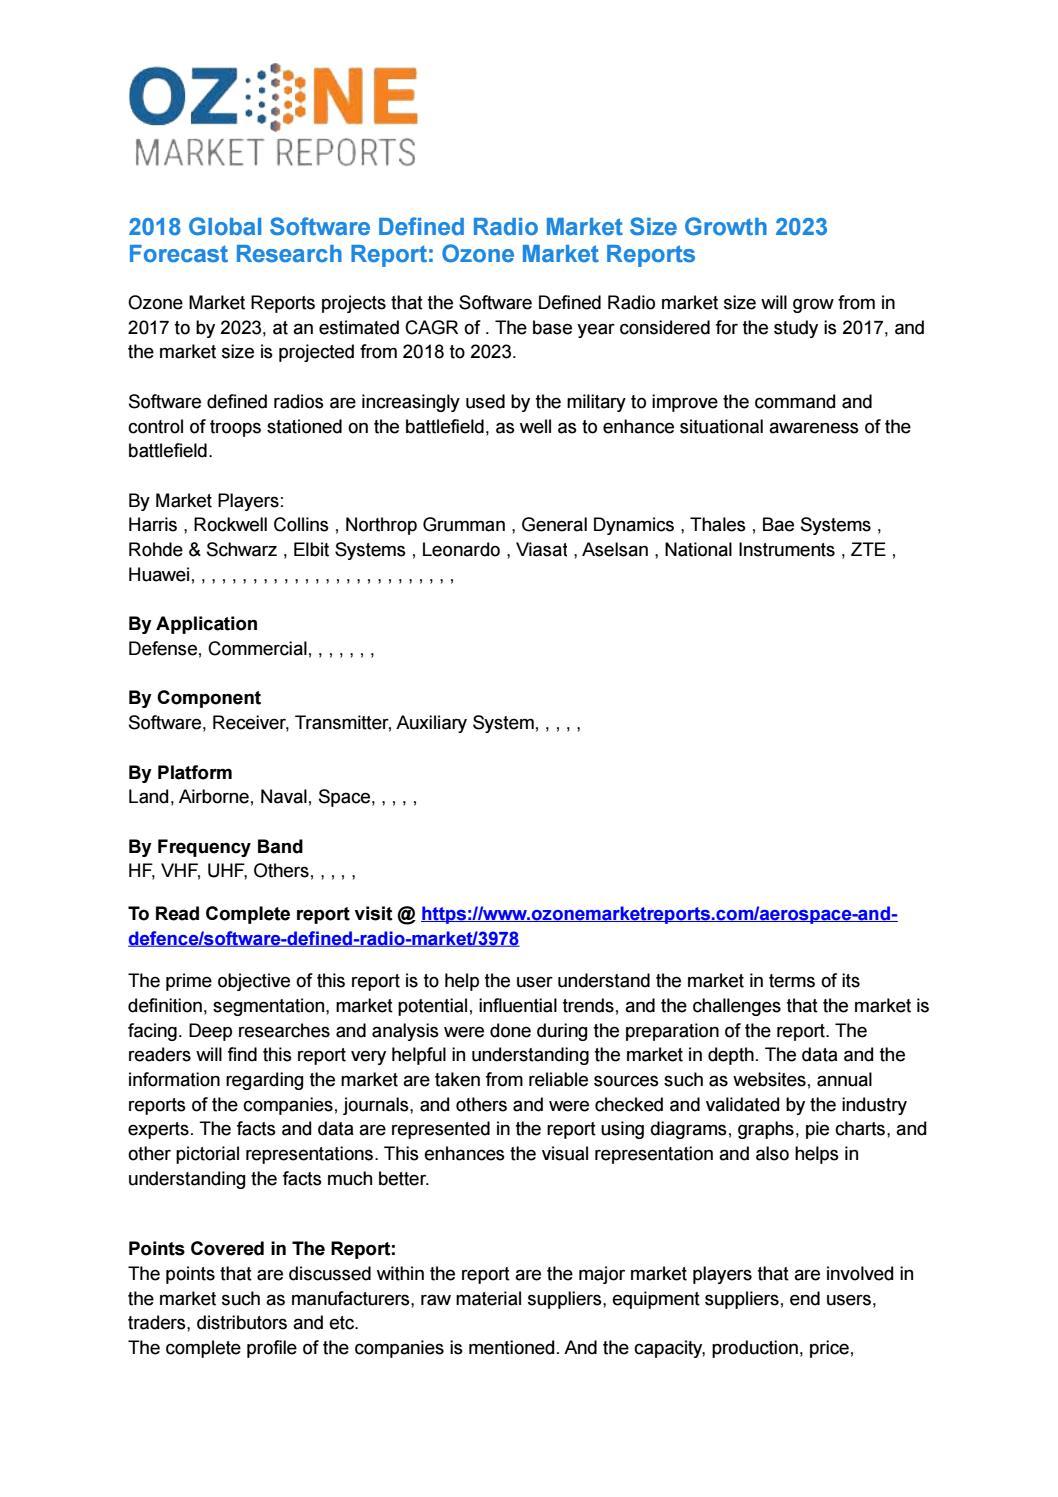 Global Software Defined Radio Market Report 2018   Ozone Market